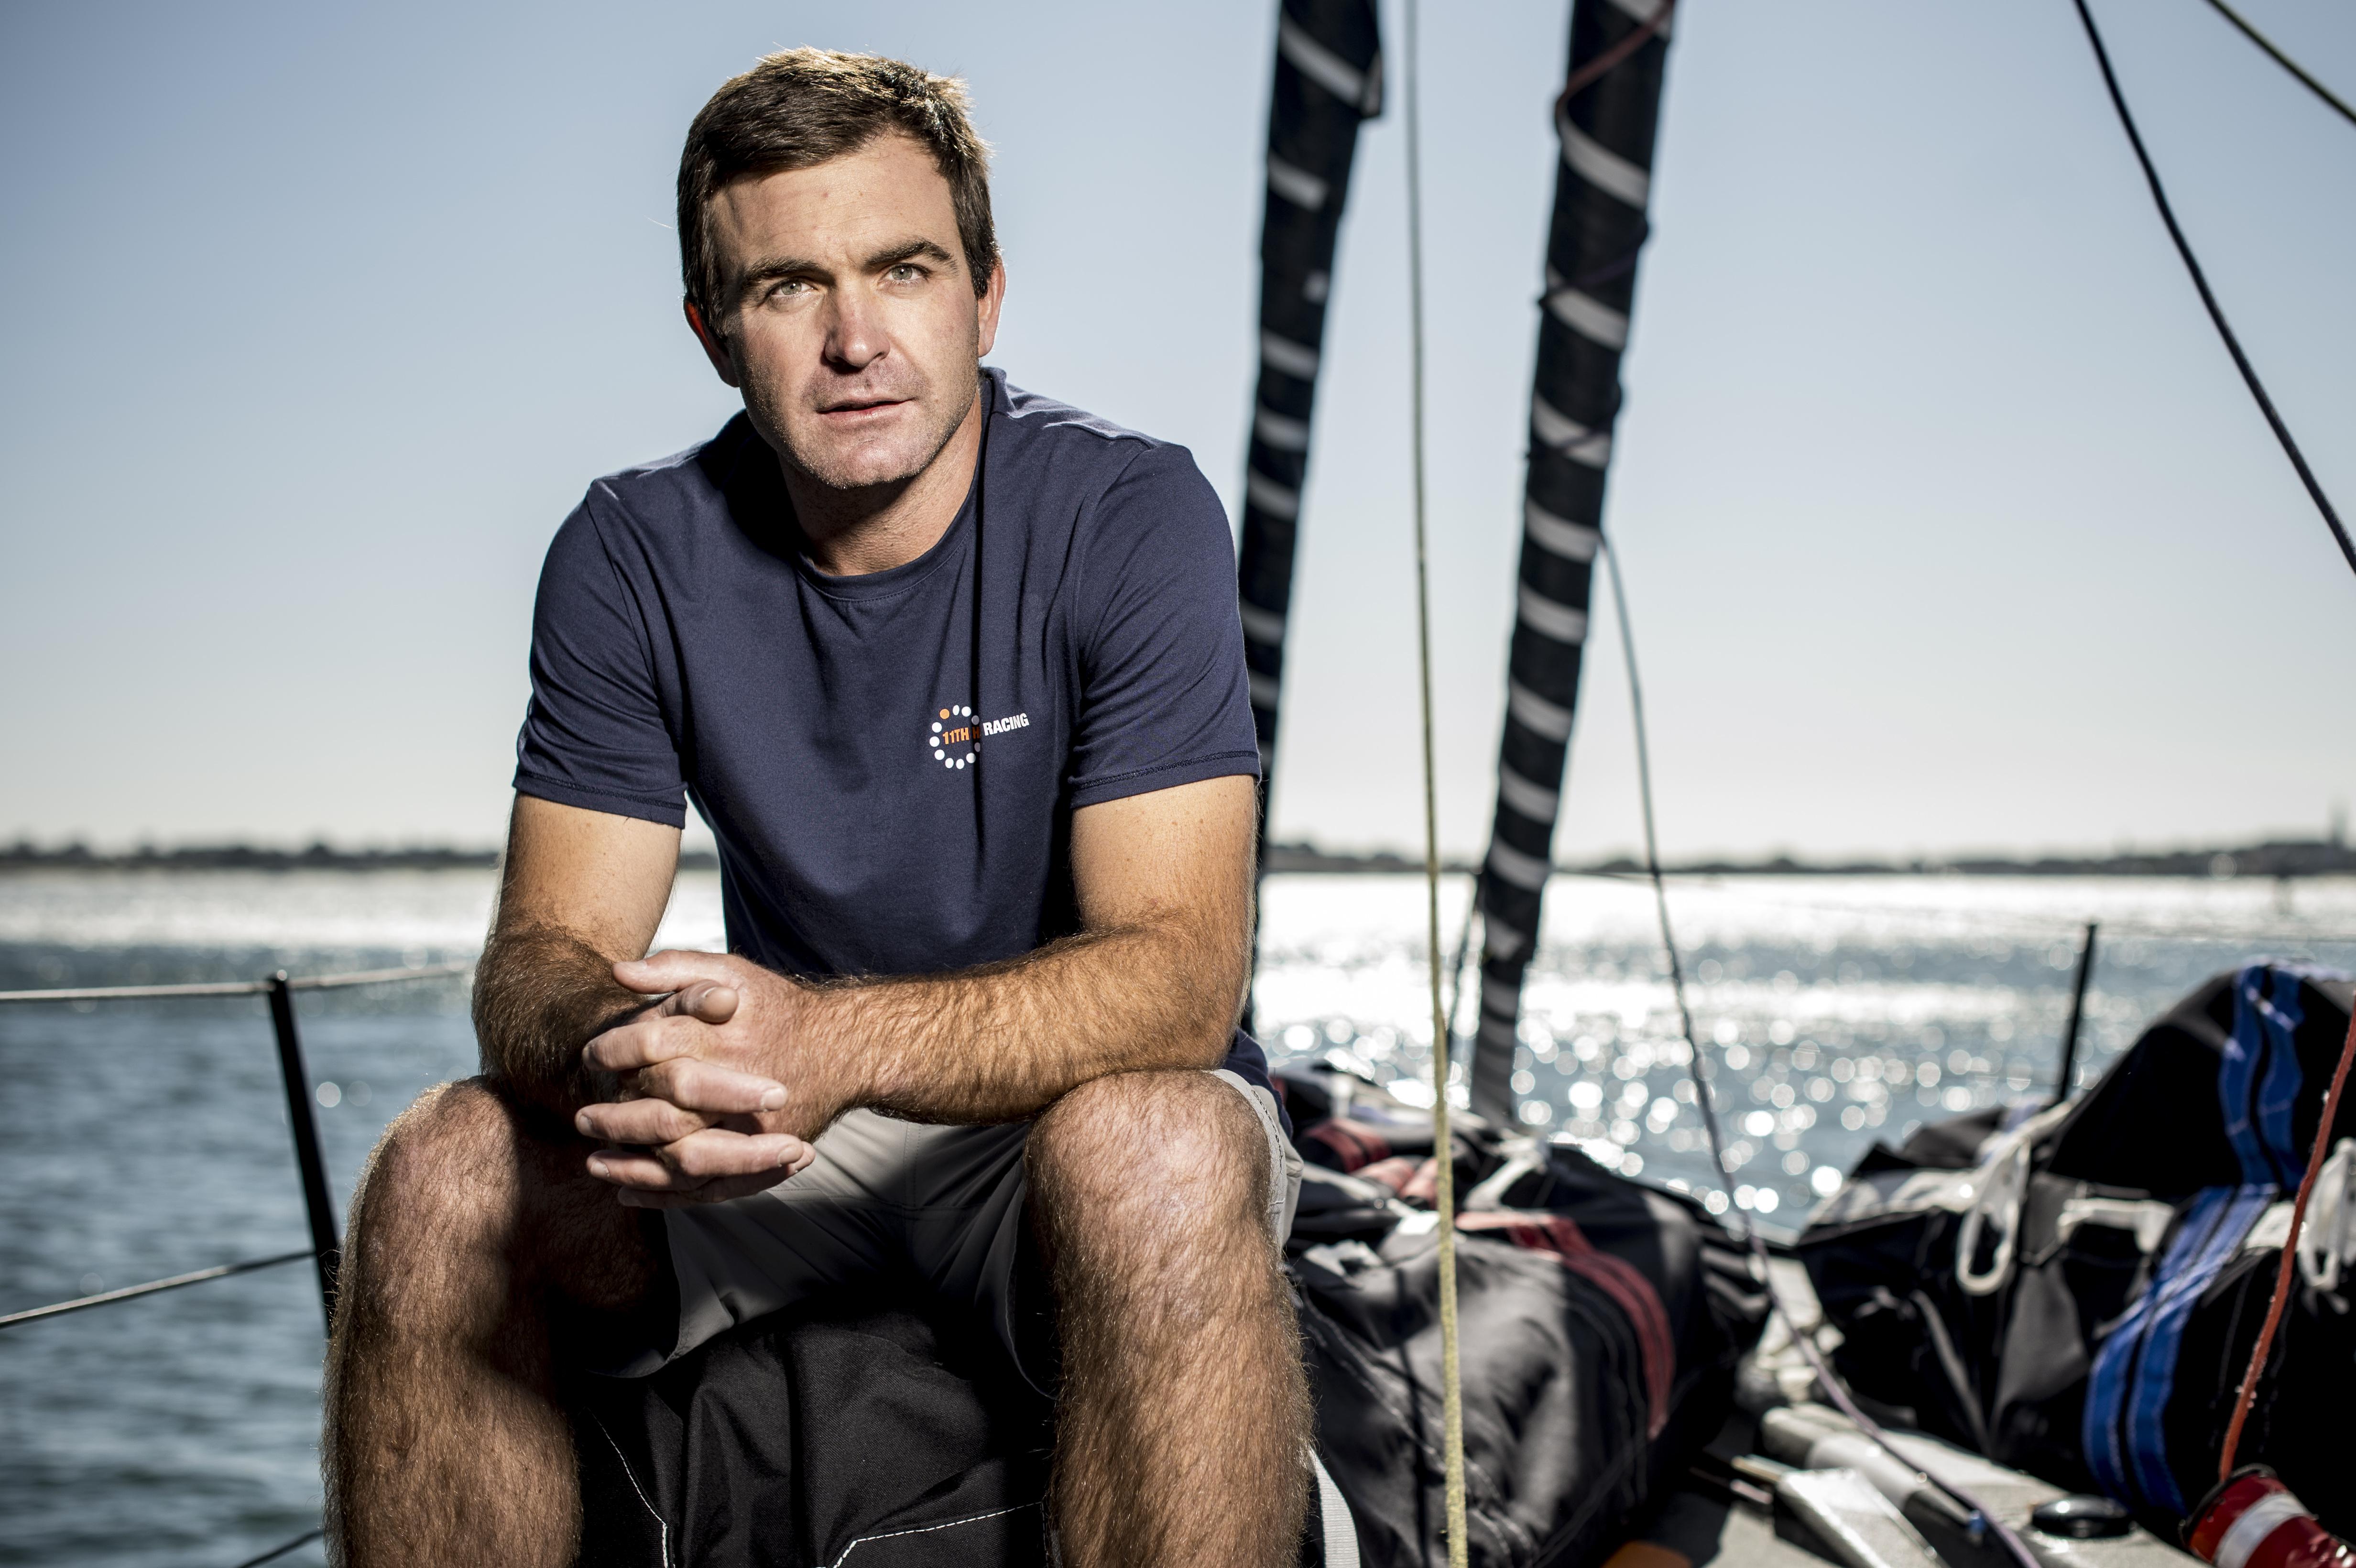 IMOCA Globe Series skipper portraits. Photo by Vincent Curutchet | IMOCA